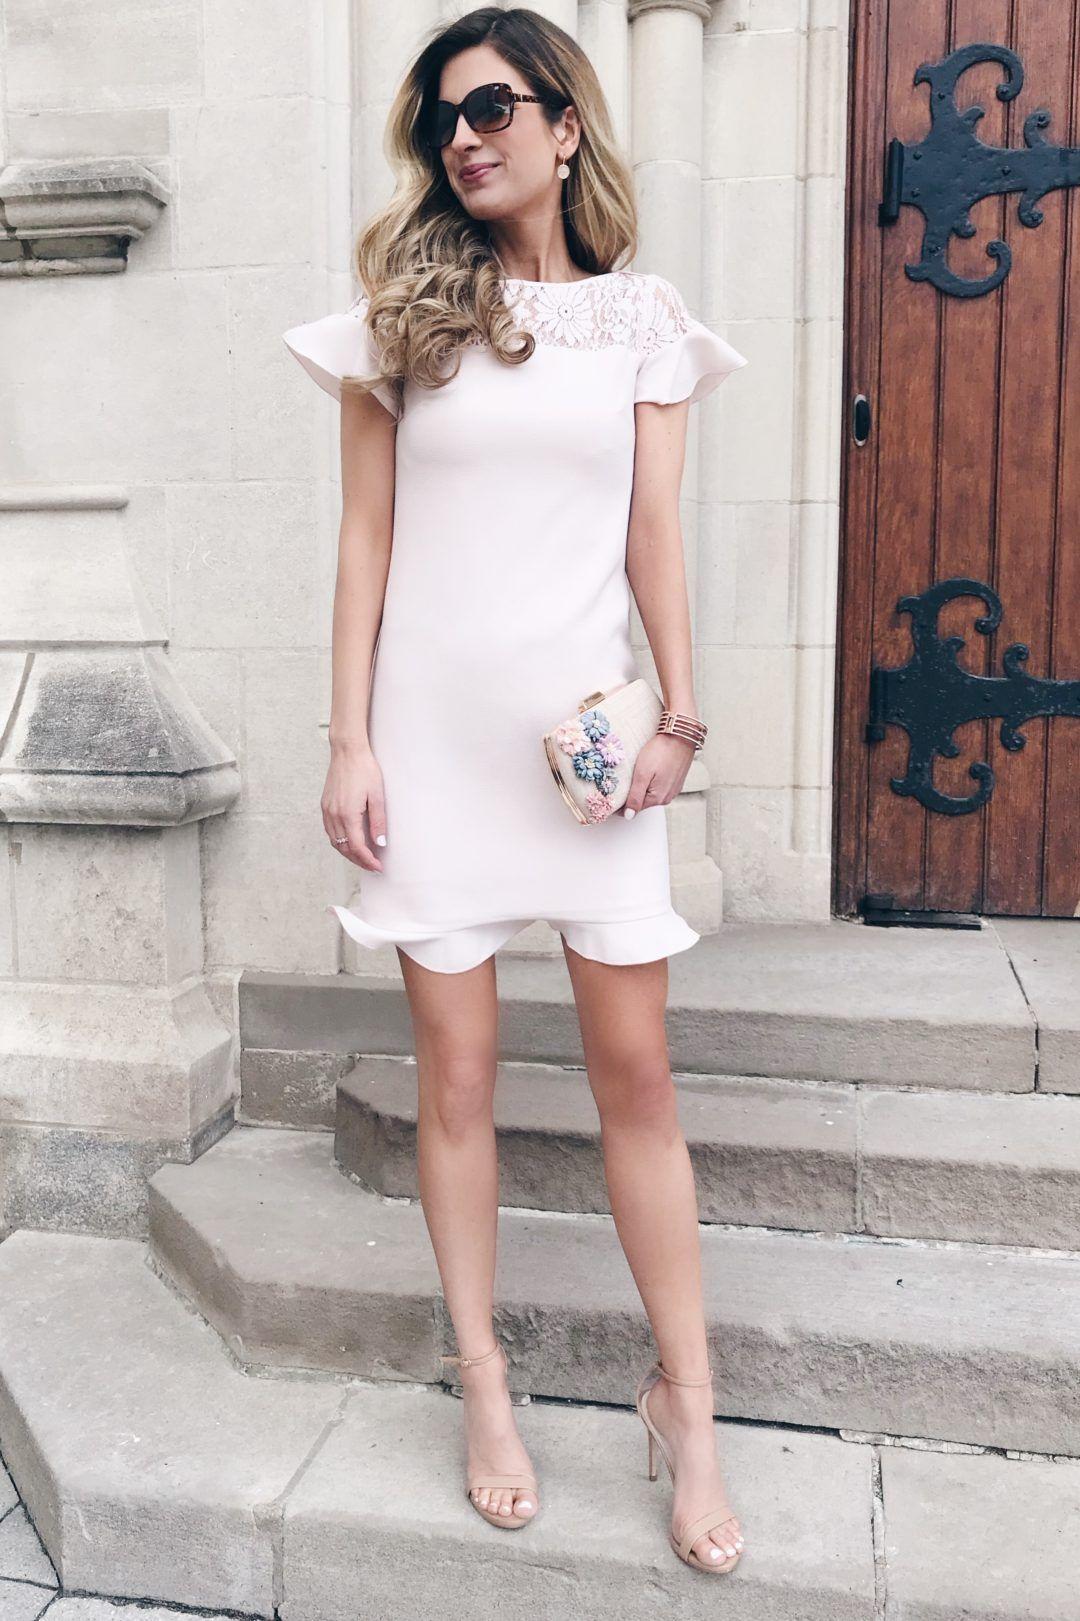 Spring Wedding Guest Dresses 2018 Favorites From The Friends And Family Sale Spring Wedding Guest Dress Fall Wedding Guest Dress White Wedding Guest Dresses [ 1621 x 1080 Pixel ]